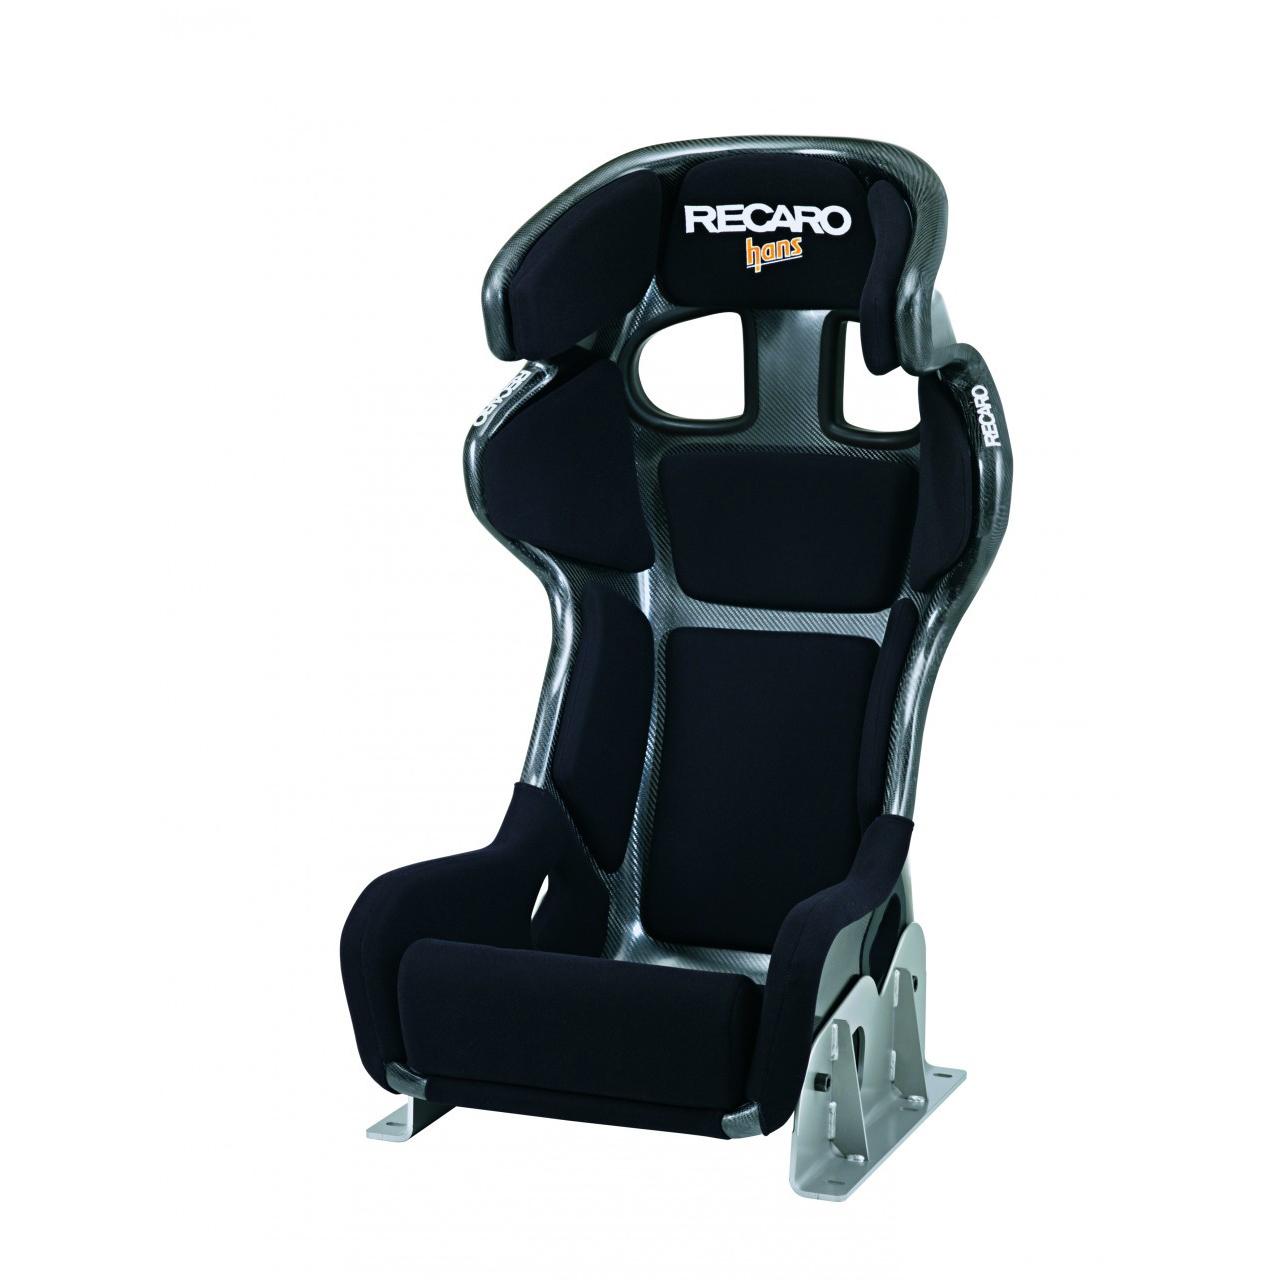 Toyota Ultima >> Recaro Pro Racer Ultima 1.0 FIA Motorsport Bucket Seat - GSM Sport Seats